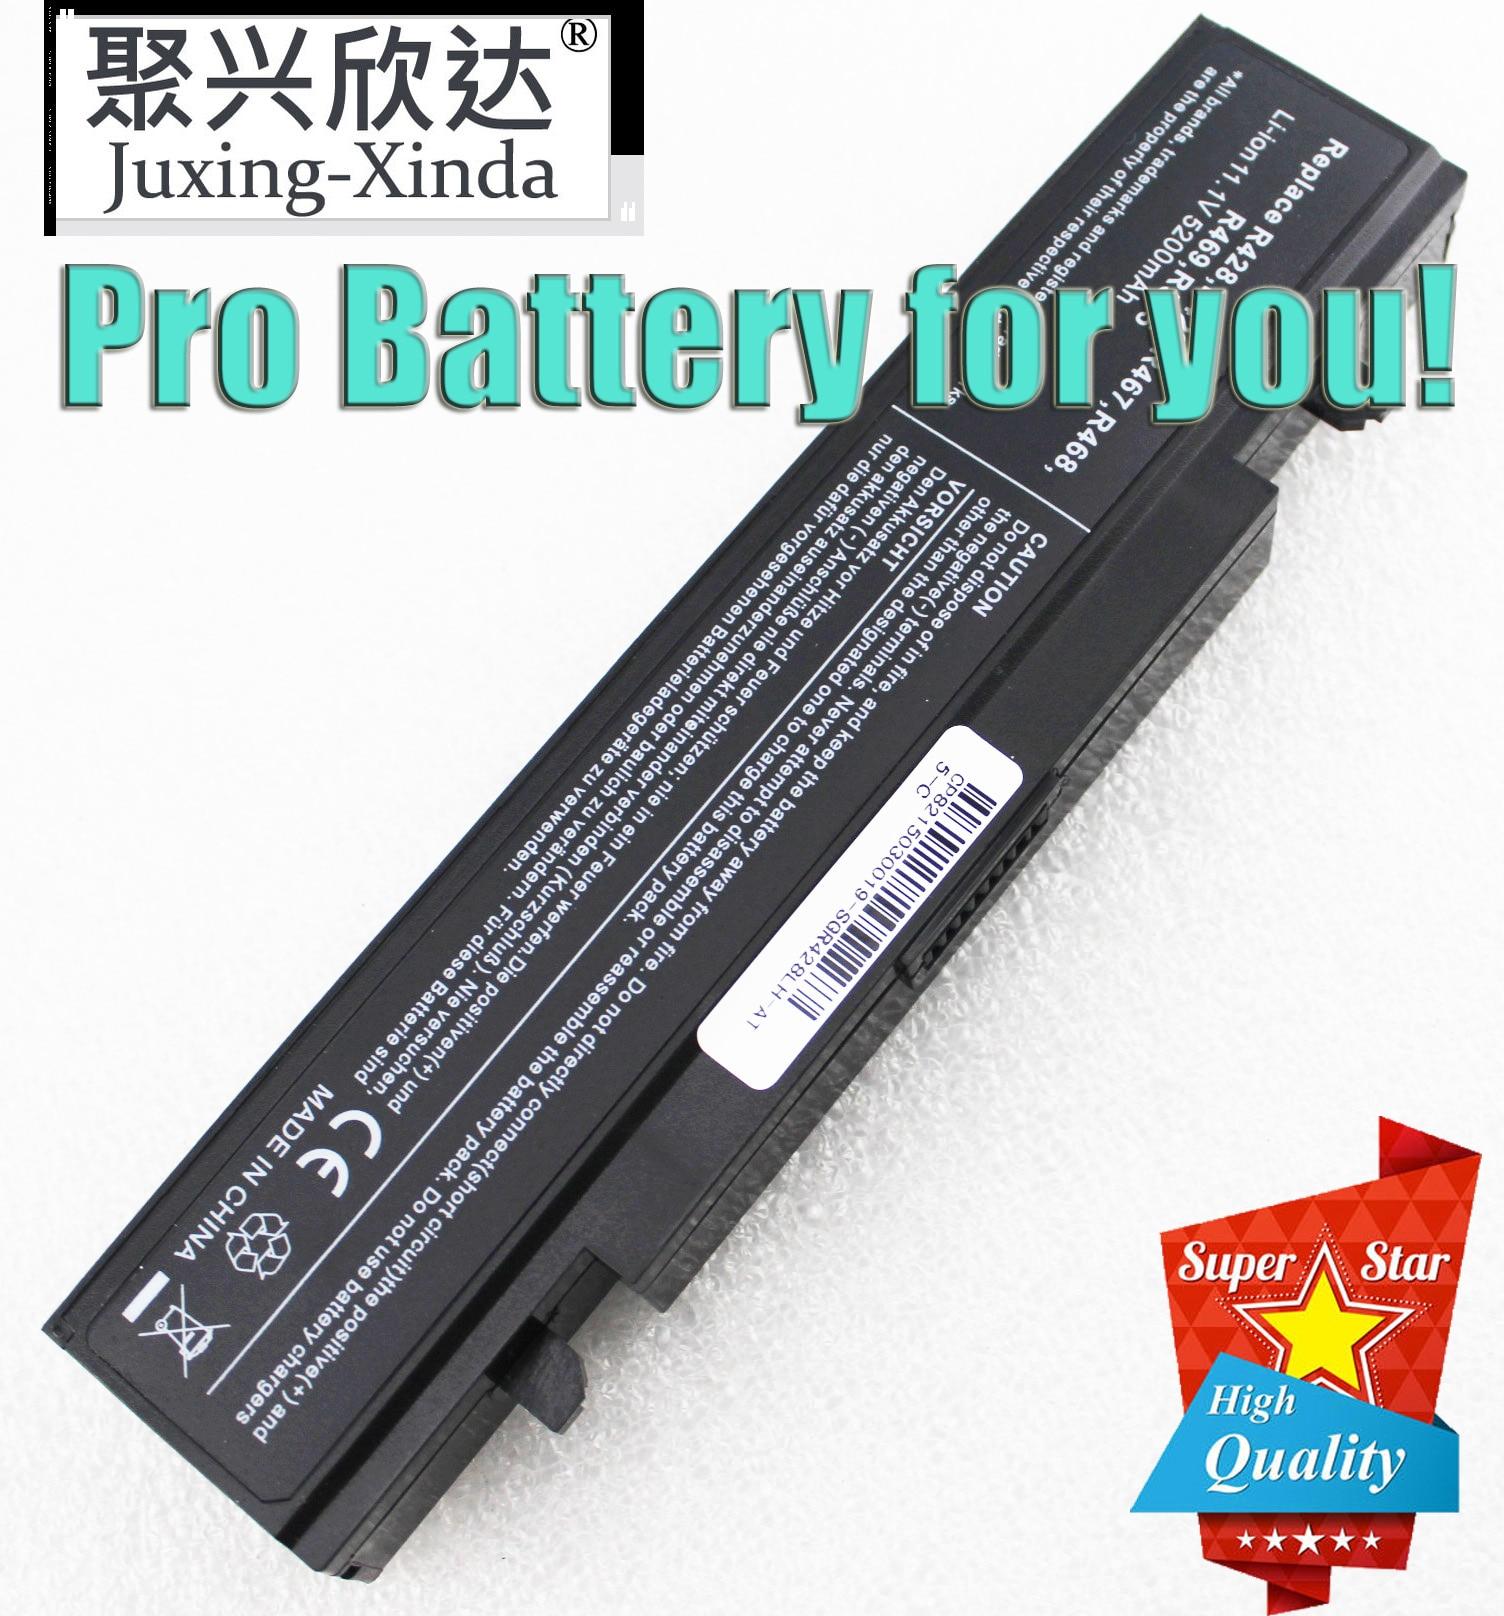 Laptop battery For SamSung R428 R429 R468 NP300 NP350 RV410 RV509 R530 R580 R528 AA-PB9NC6B AA-PB9NS6B AA-PB9NC6W AA-PL9NC6W фото